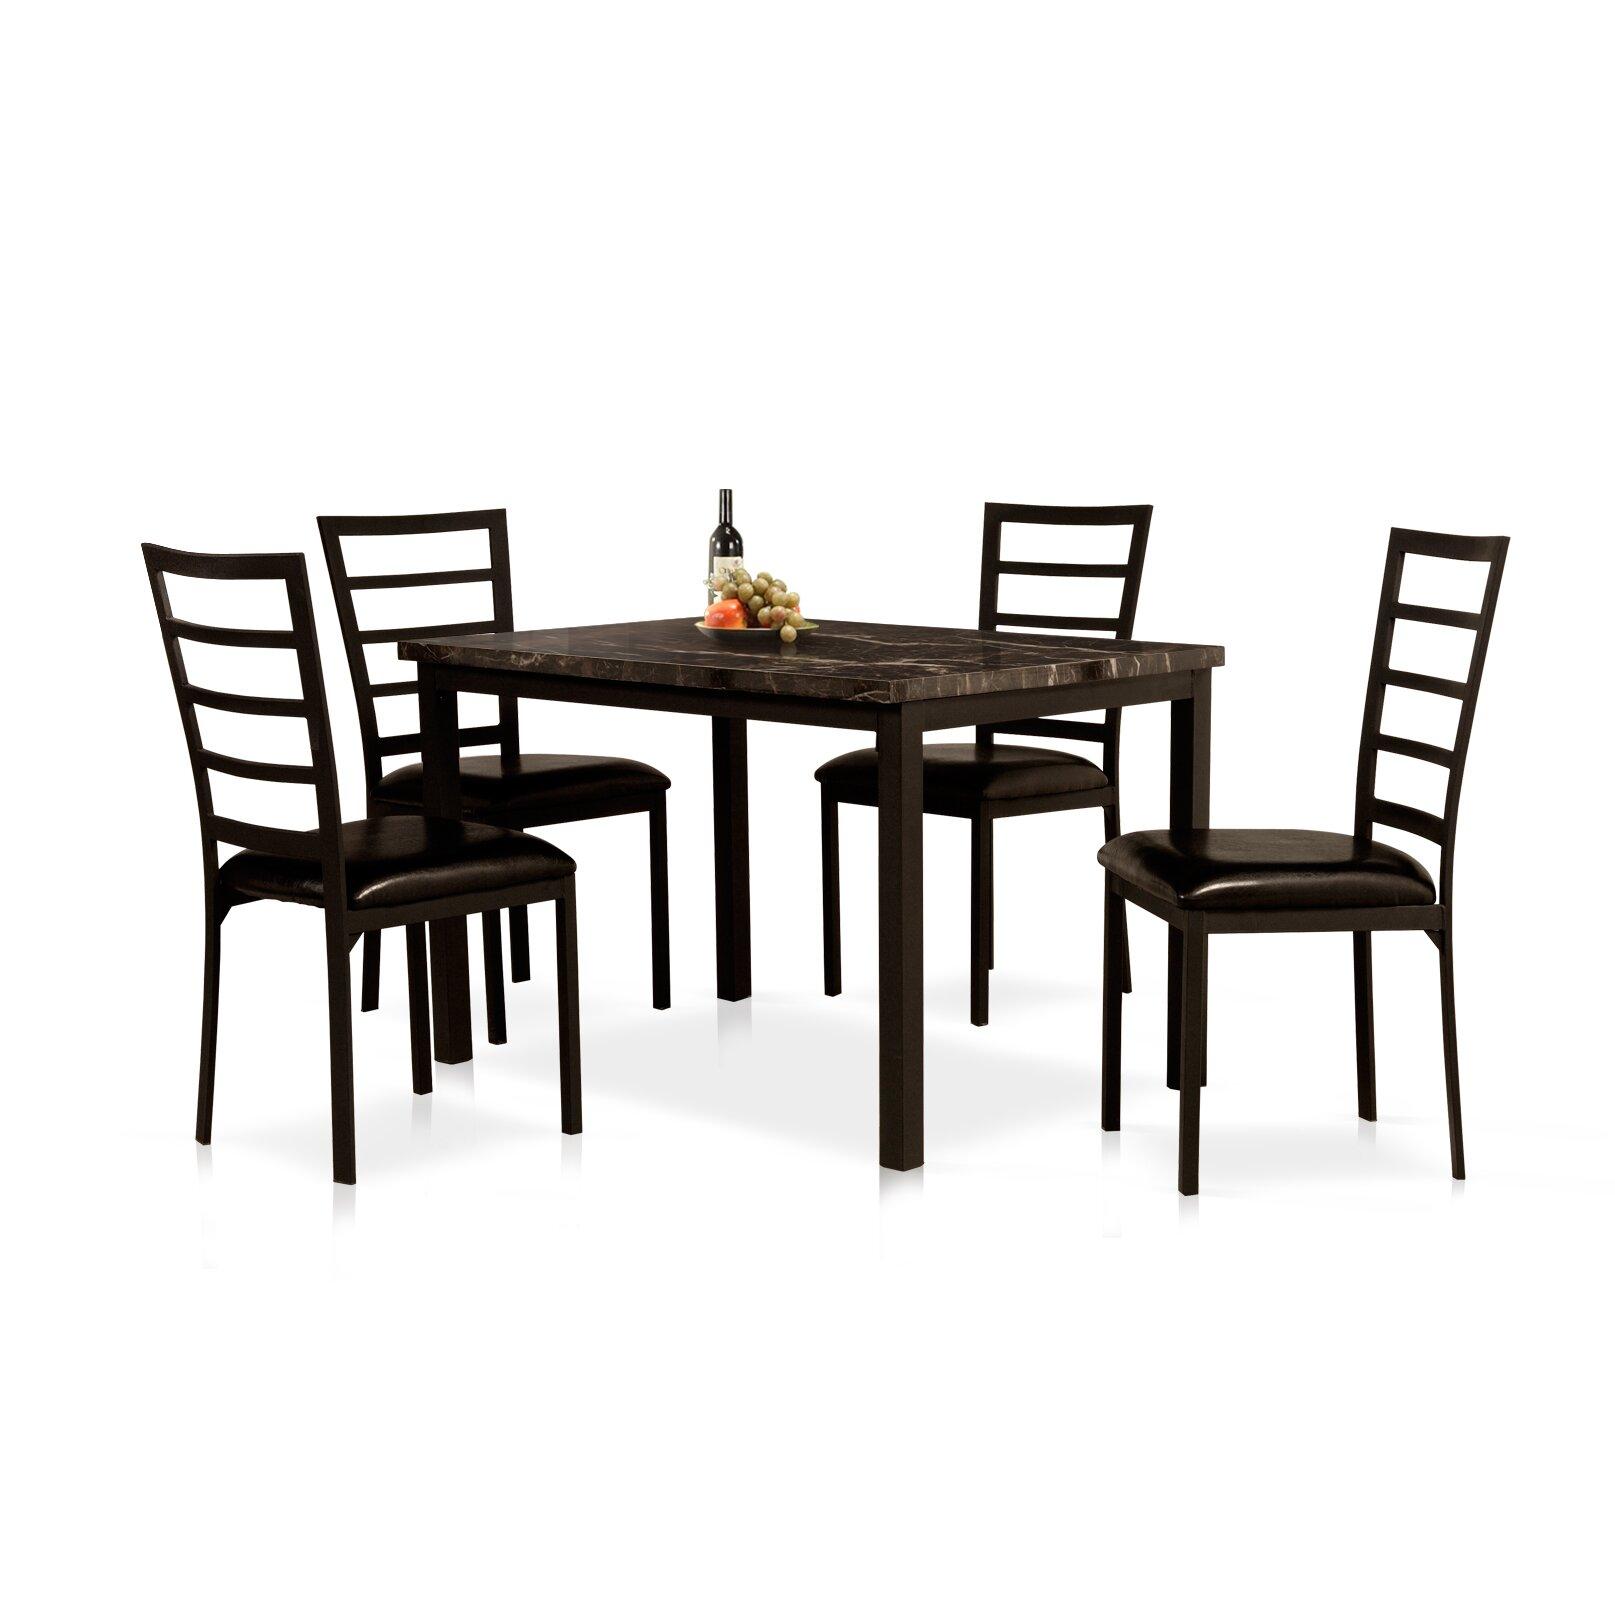 Wildon home 5 piece dining set reviews wayfair for 5 piece dining set